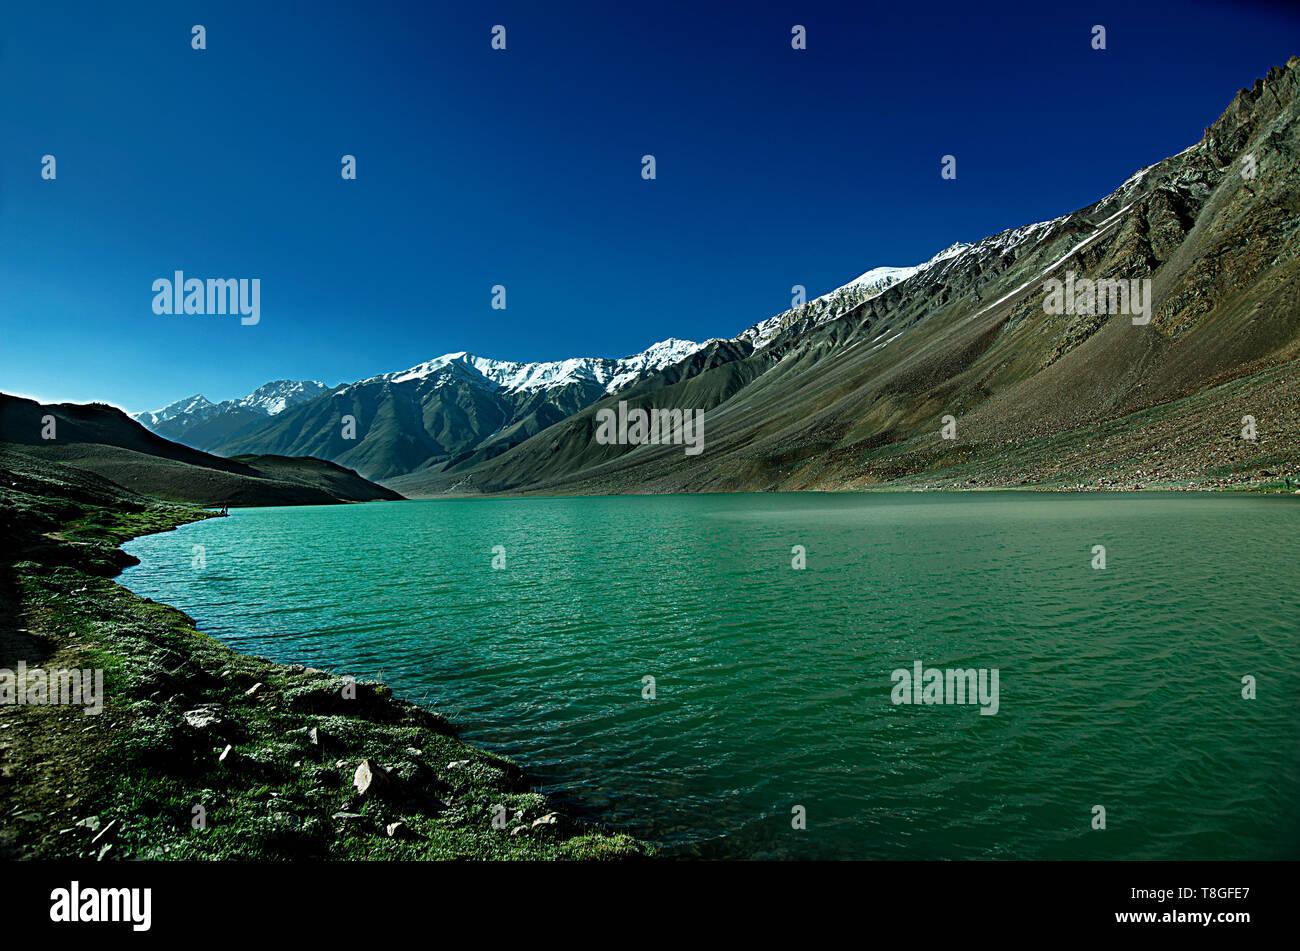 Chandratal Lake, Spiti Valley, Himachal Pradesh, India - Stock Image